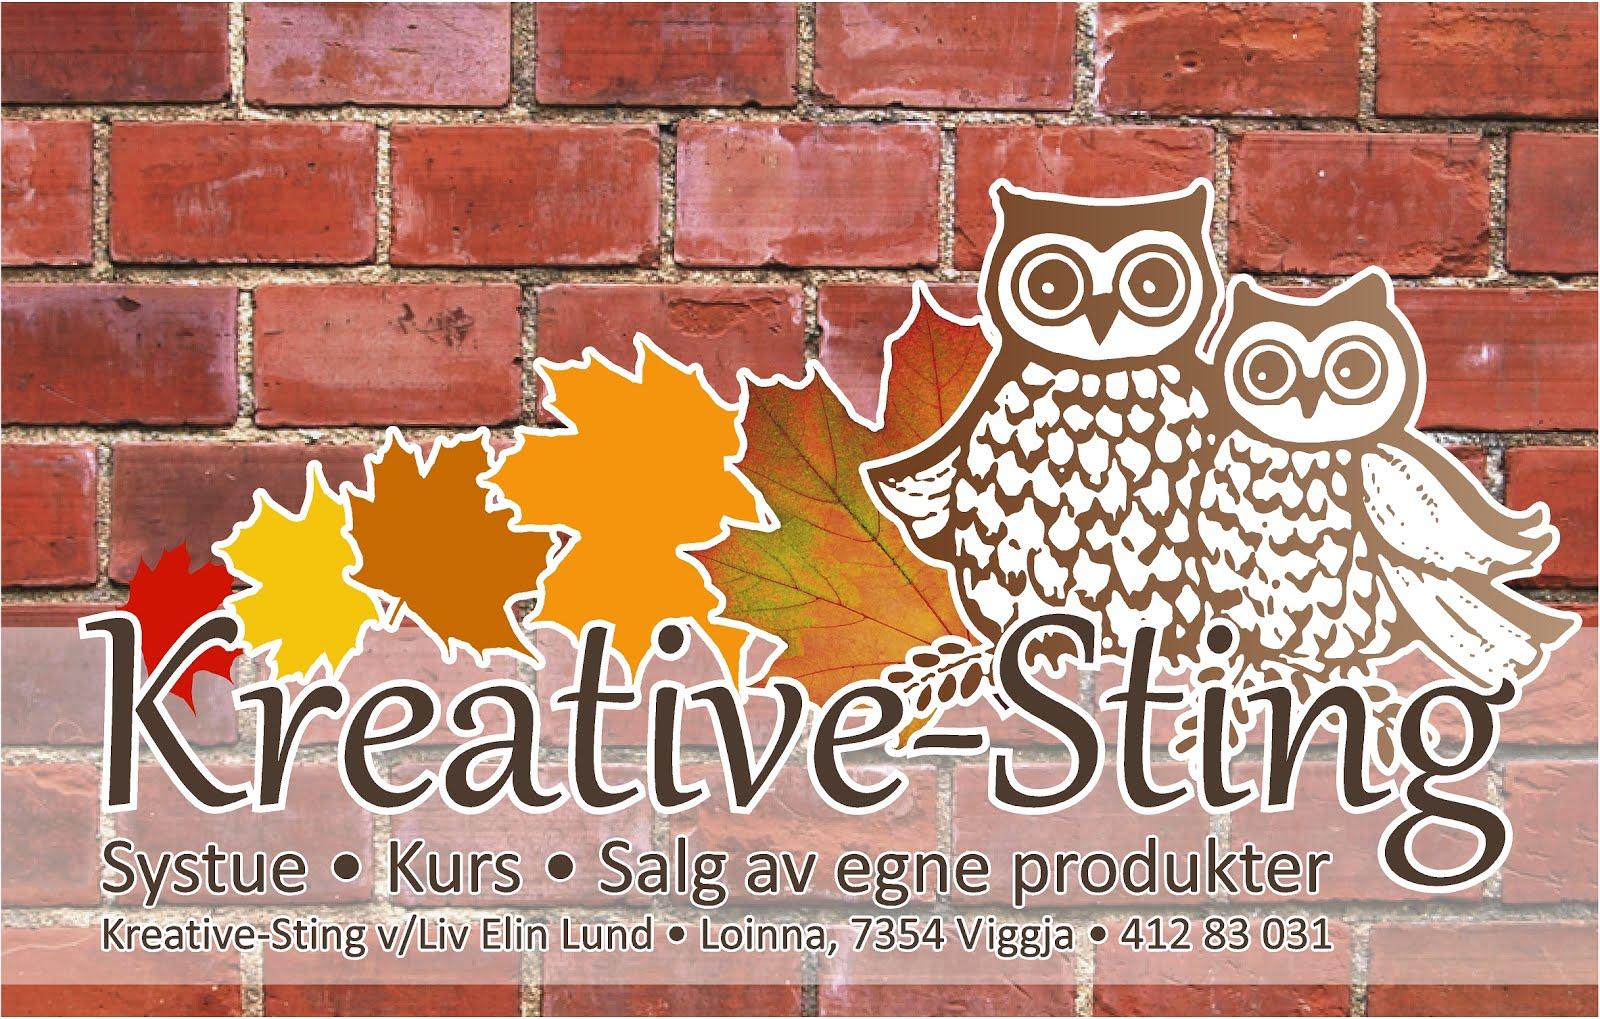 Kreative-Sting